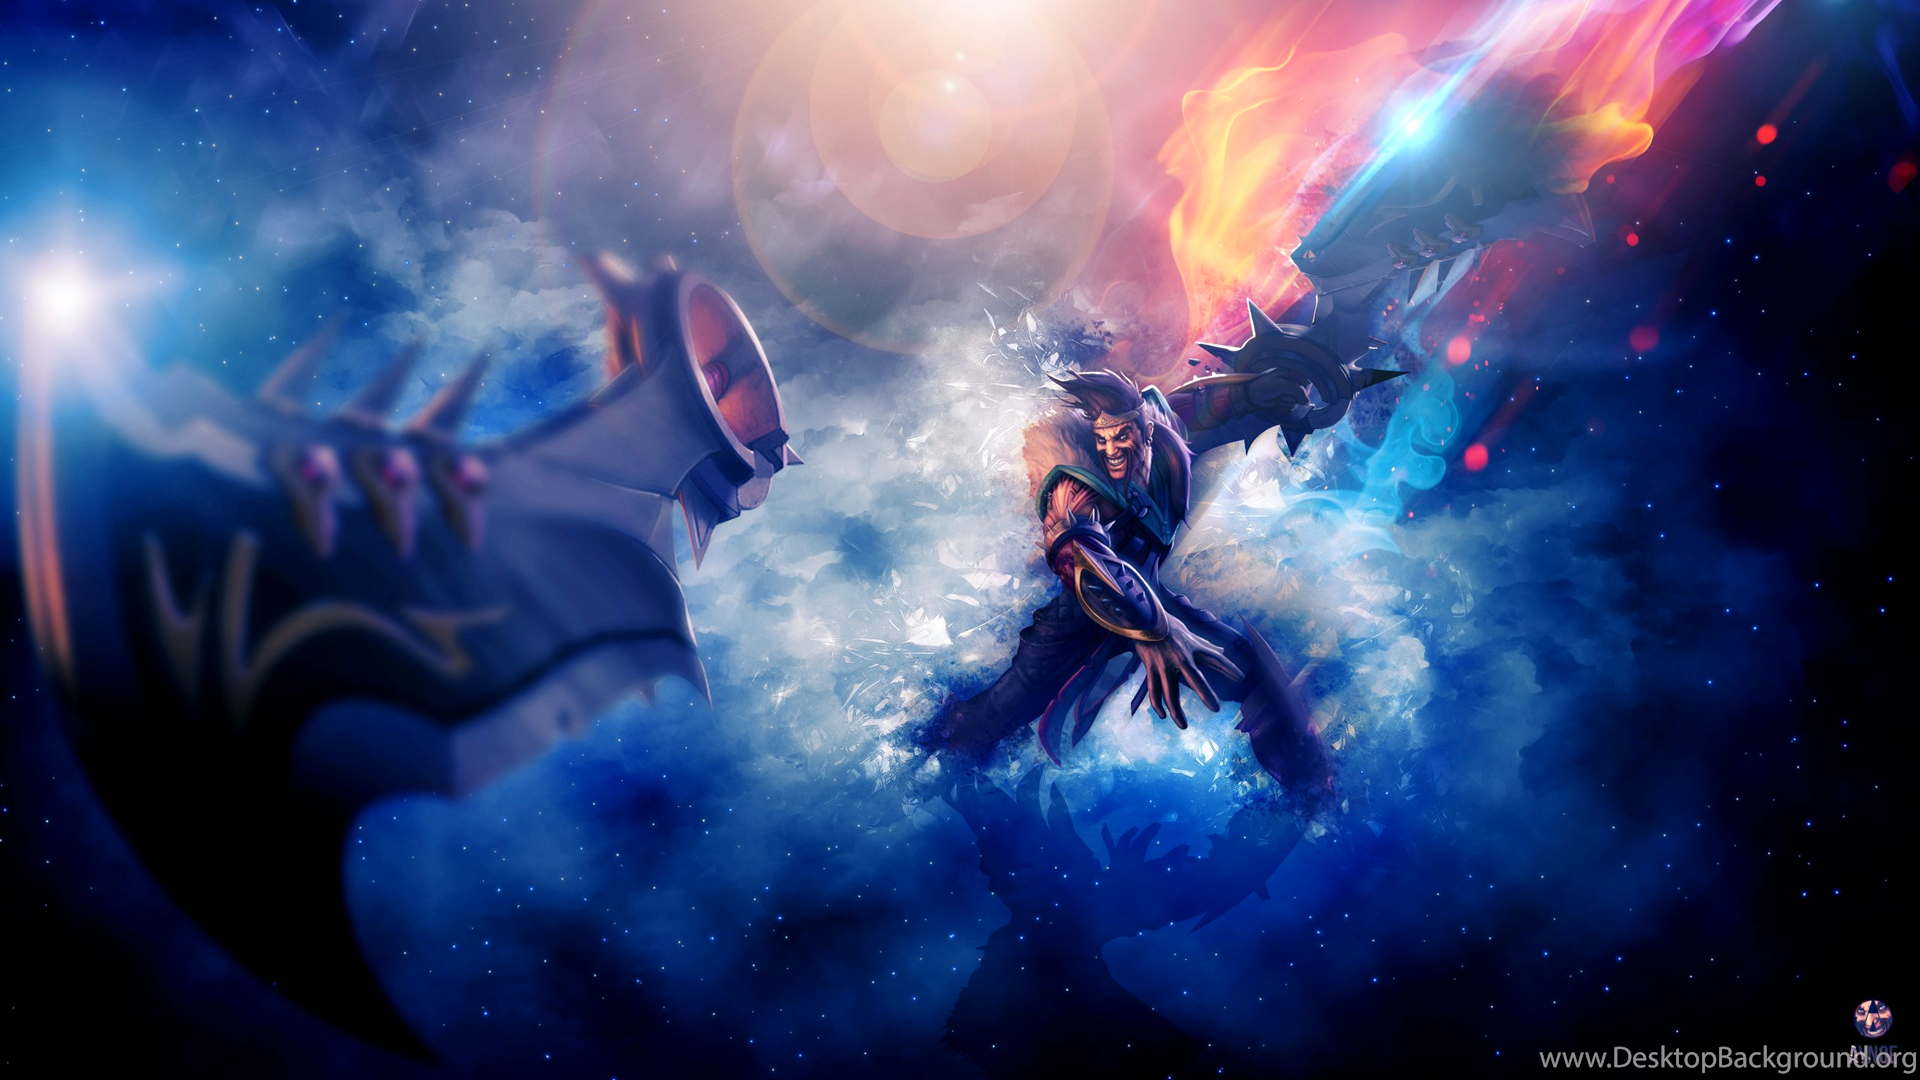 League Of Legends Varus Wallpapers Wide Games Wallpapers Kokean